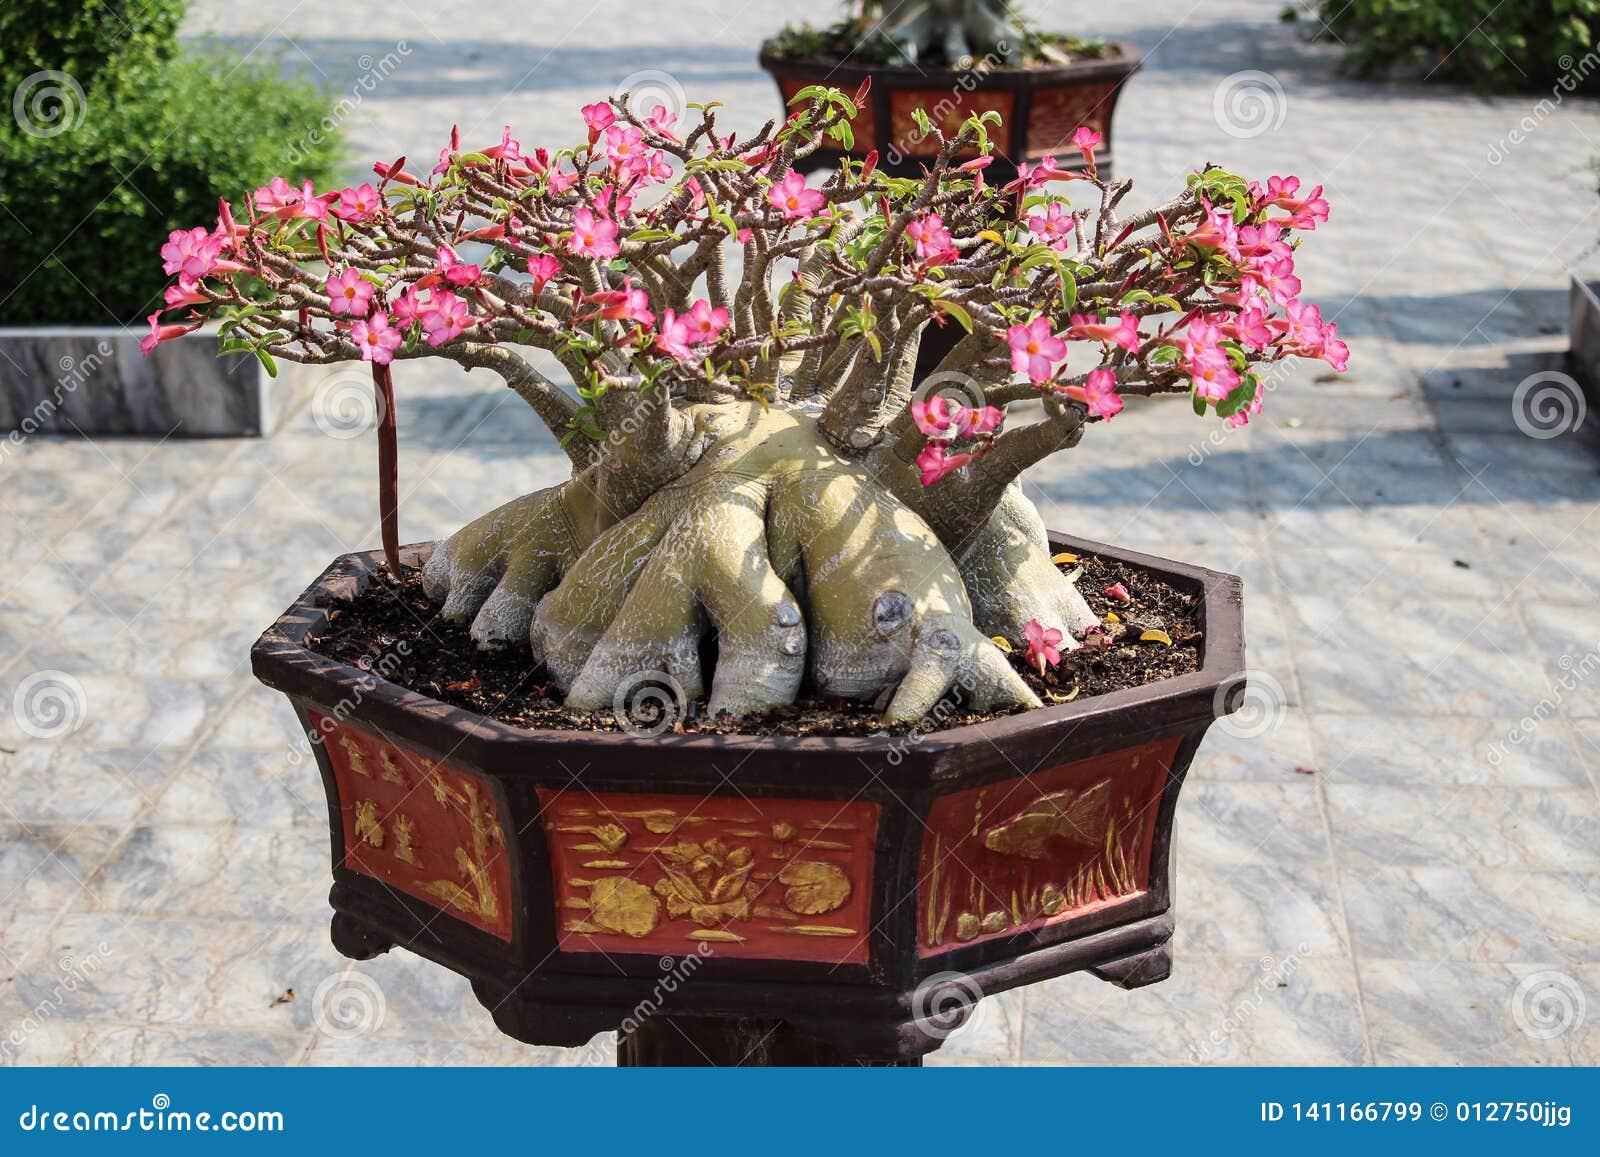 Old Large Desert Rose Bonsai Tree In Pot Stock Image Image Of Desert Rose 141166799